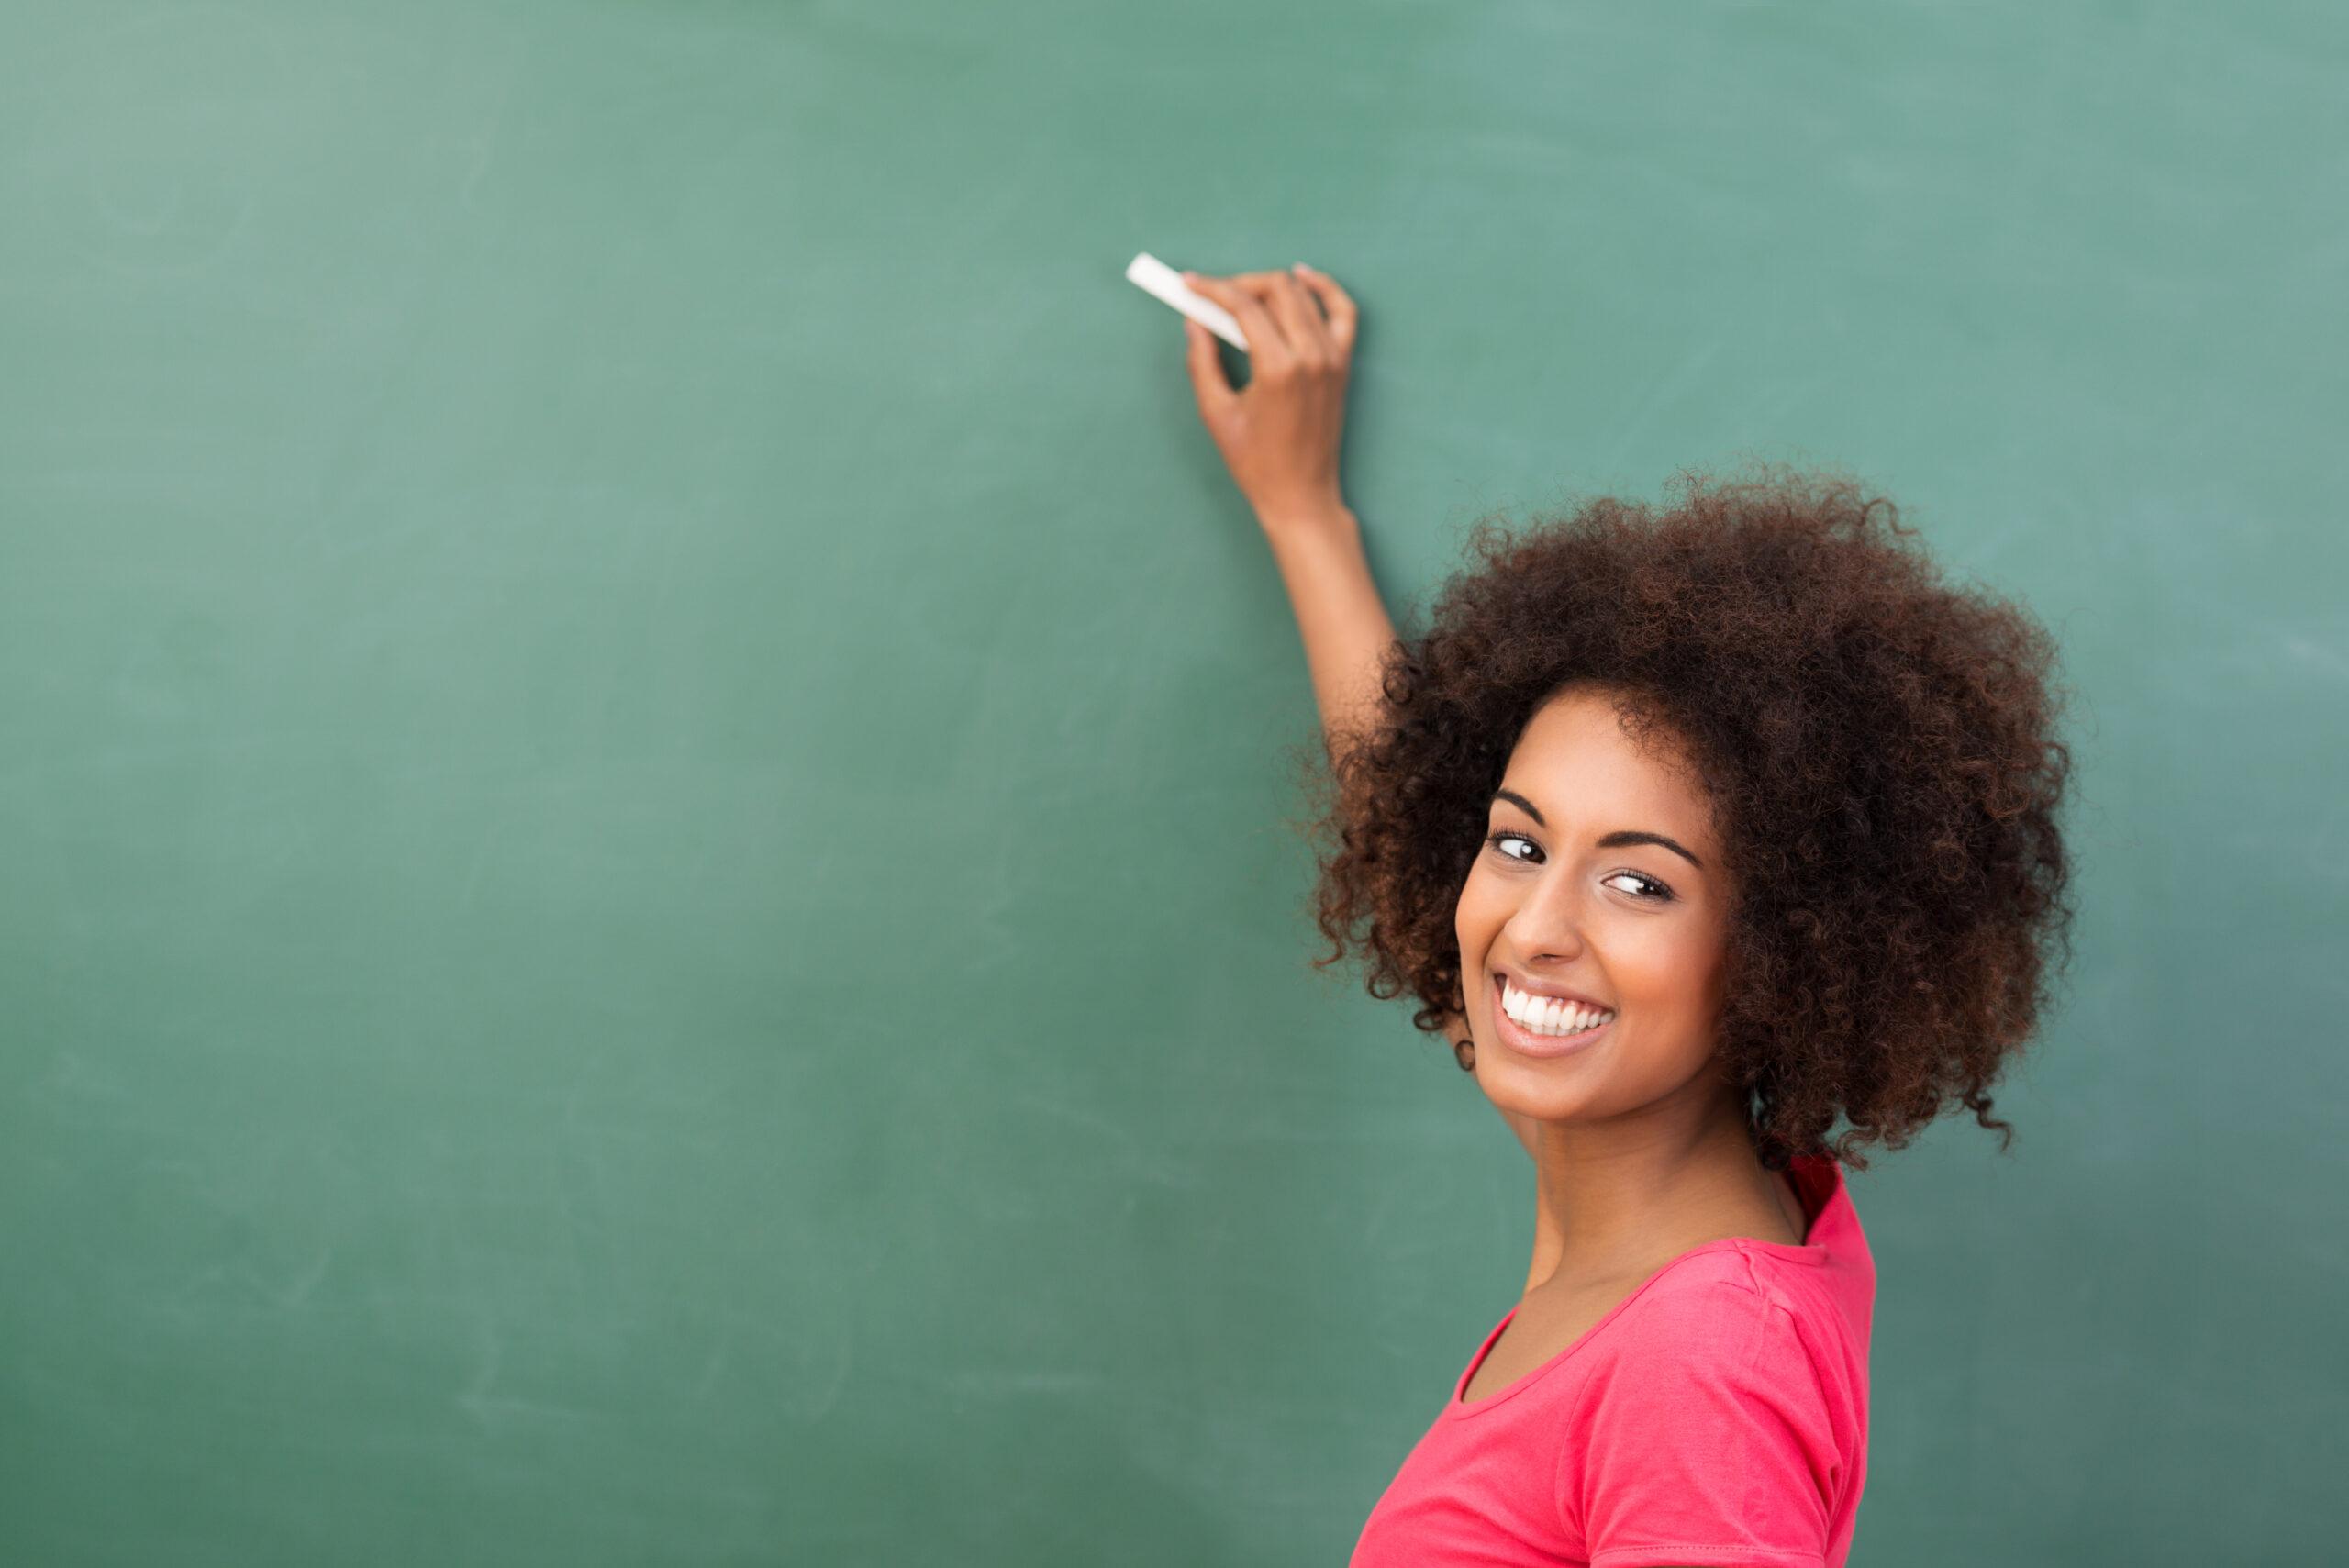 Traditional Teaching & Curriculum